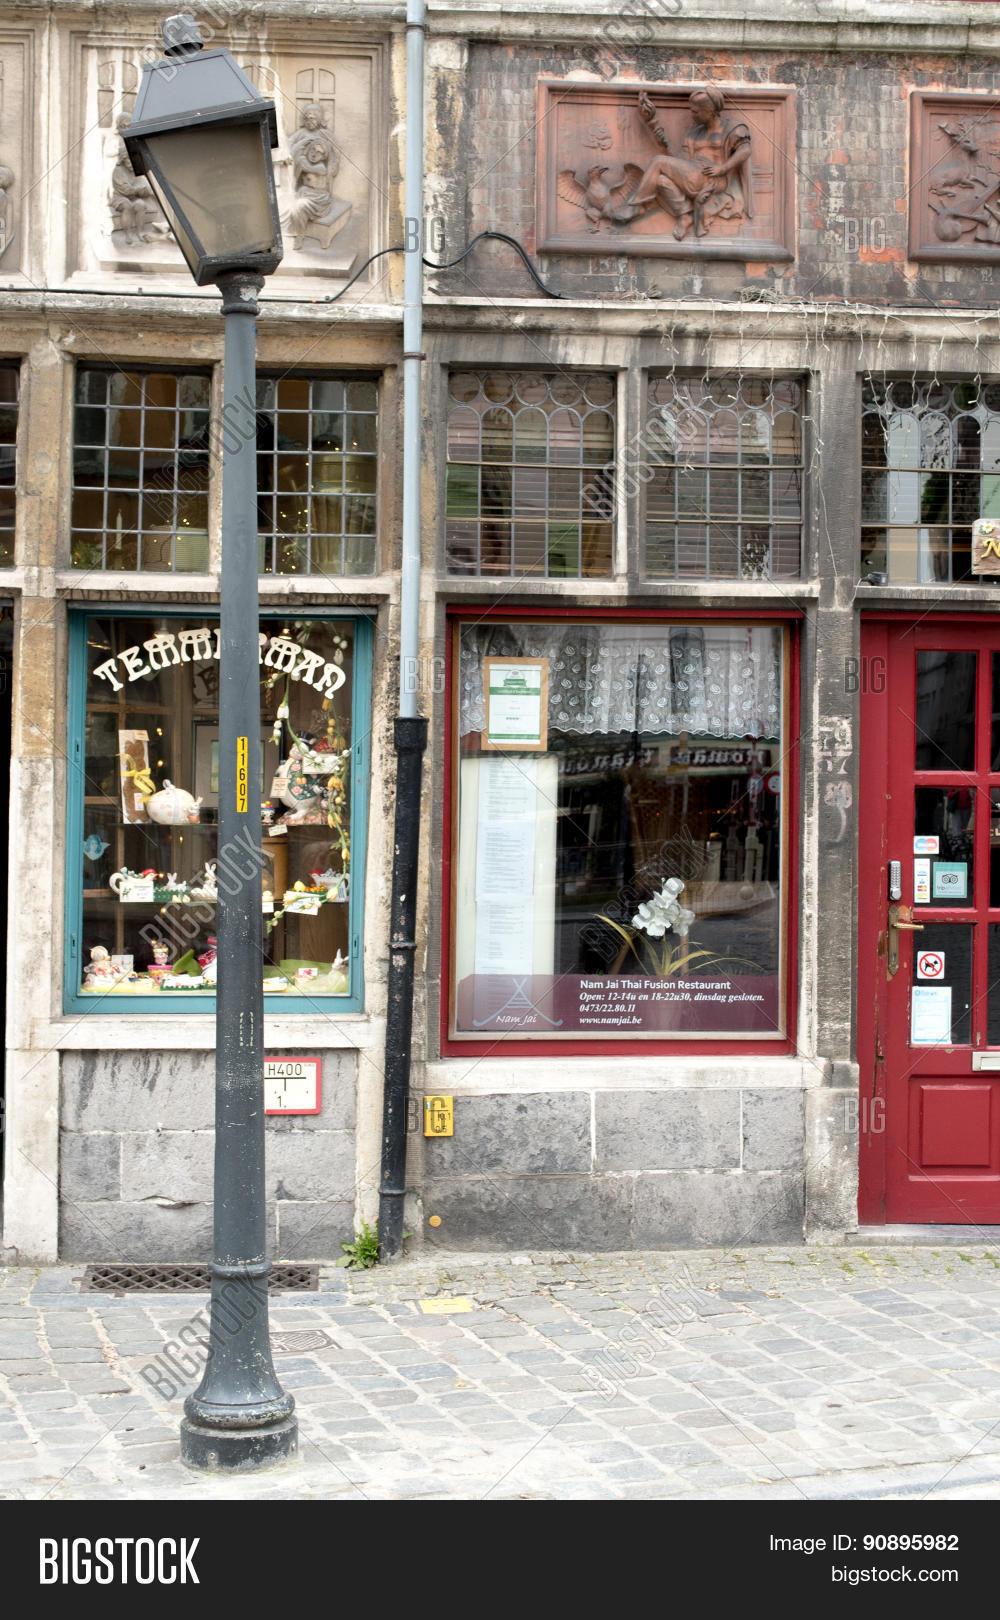 Vintage Shop Front Image & Photo (Free Trial) | Bigstock